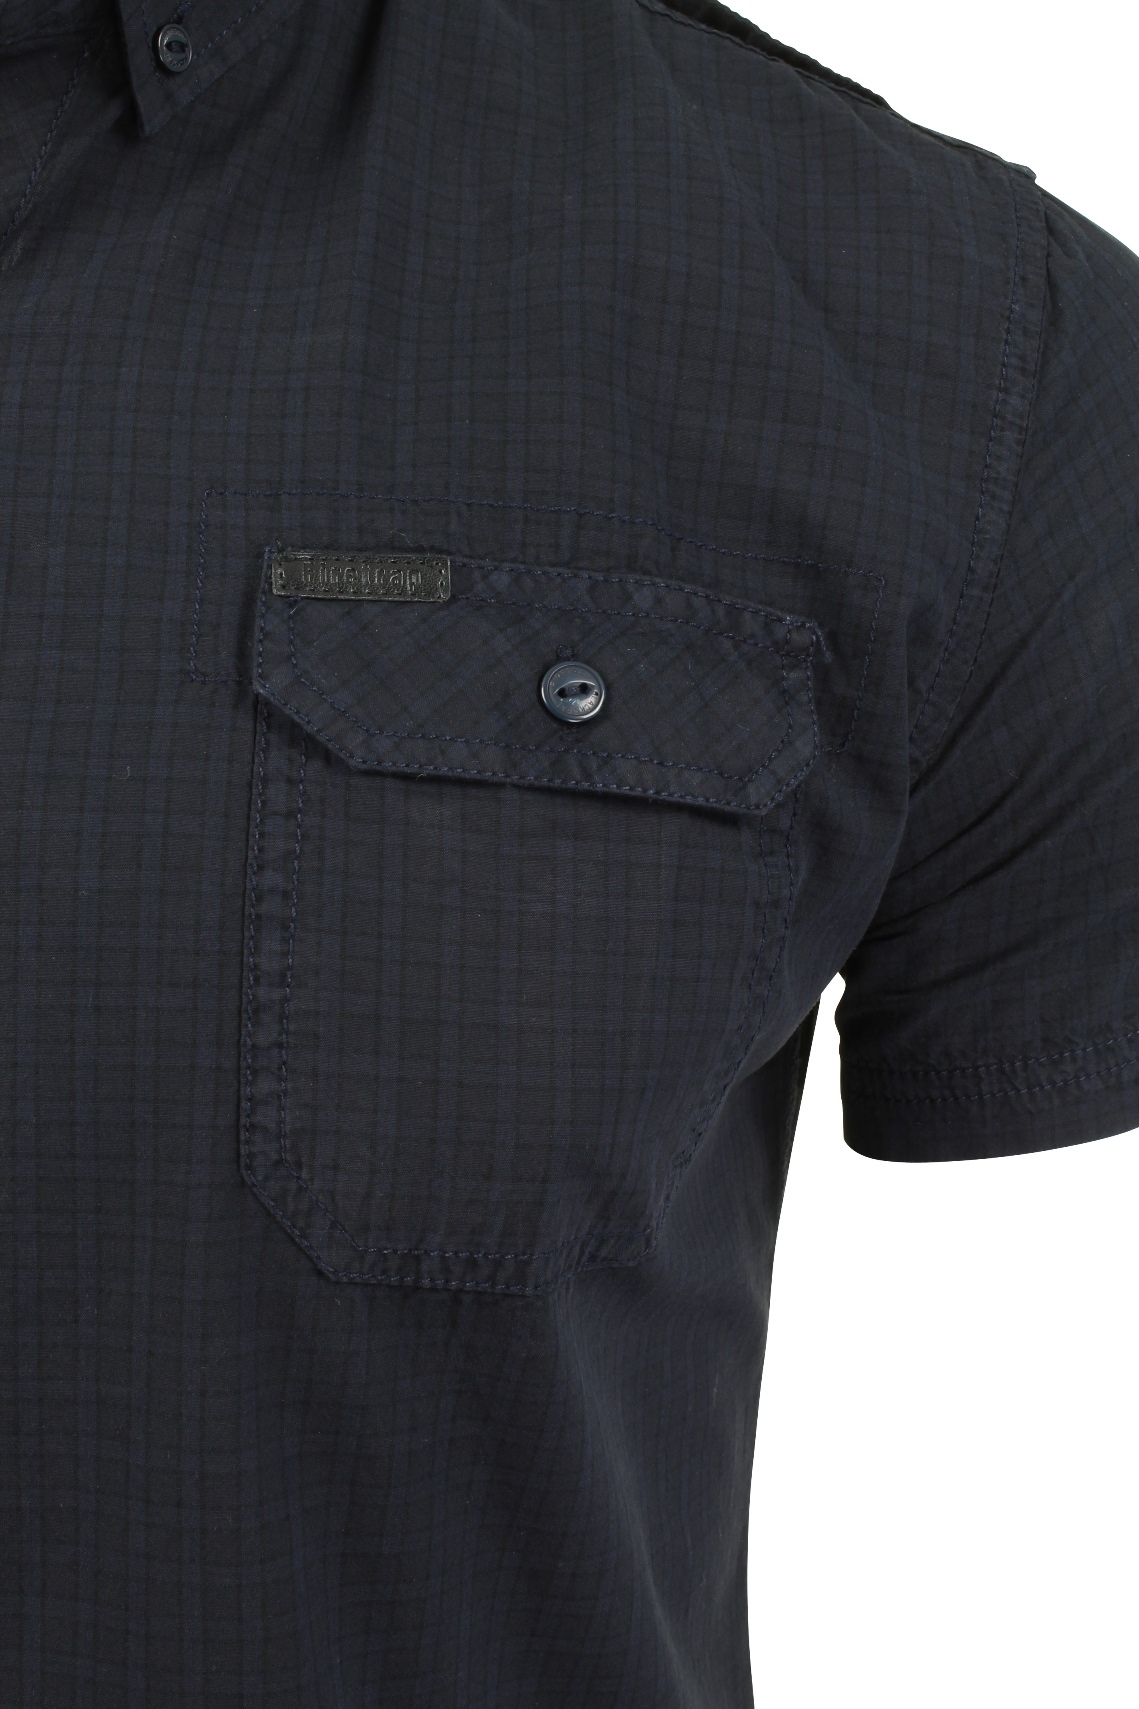 Mens-Short-Sleeved-Shirt-by-Firetrap thumbnail 25